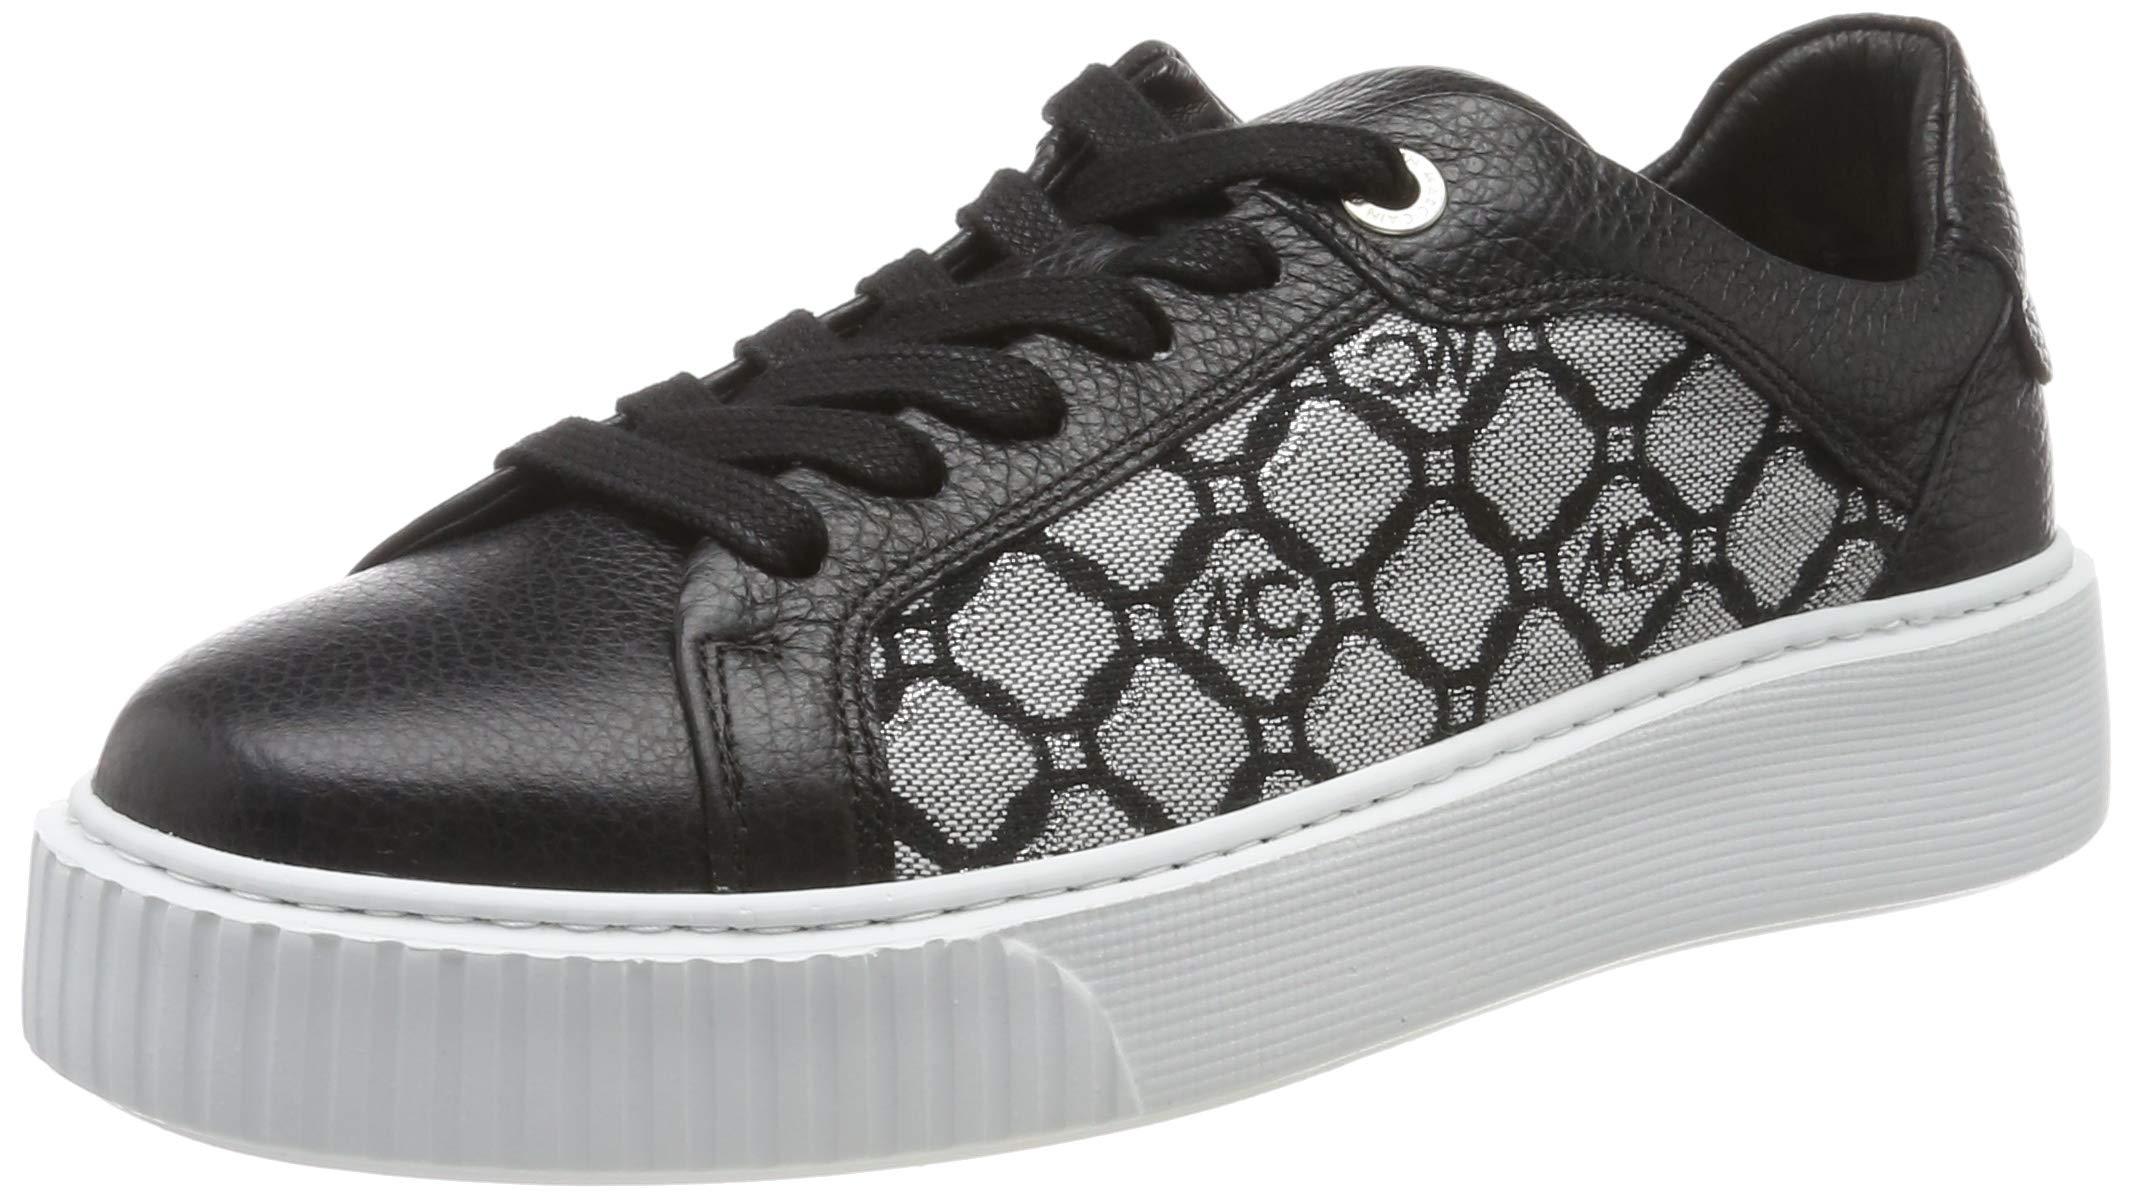 Marc SneakerSneakers Cain 90038 Basses Eu FemmeMulticoloreblack 3ARj4qL5